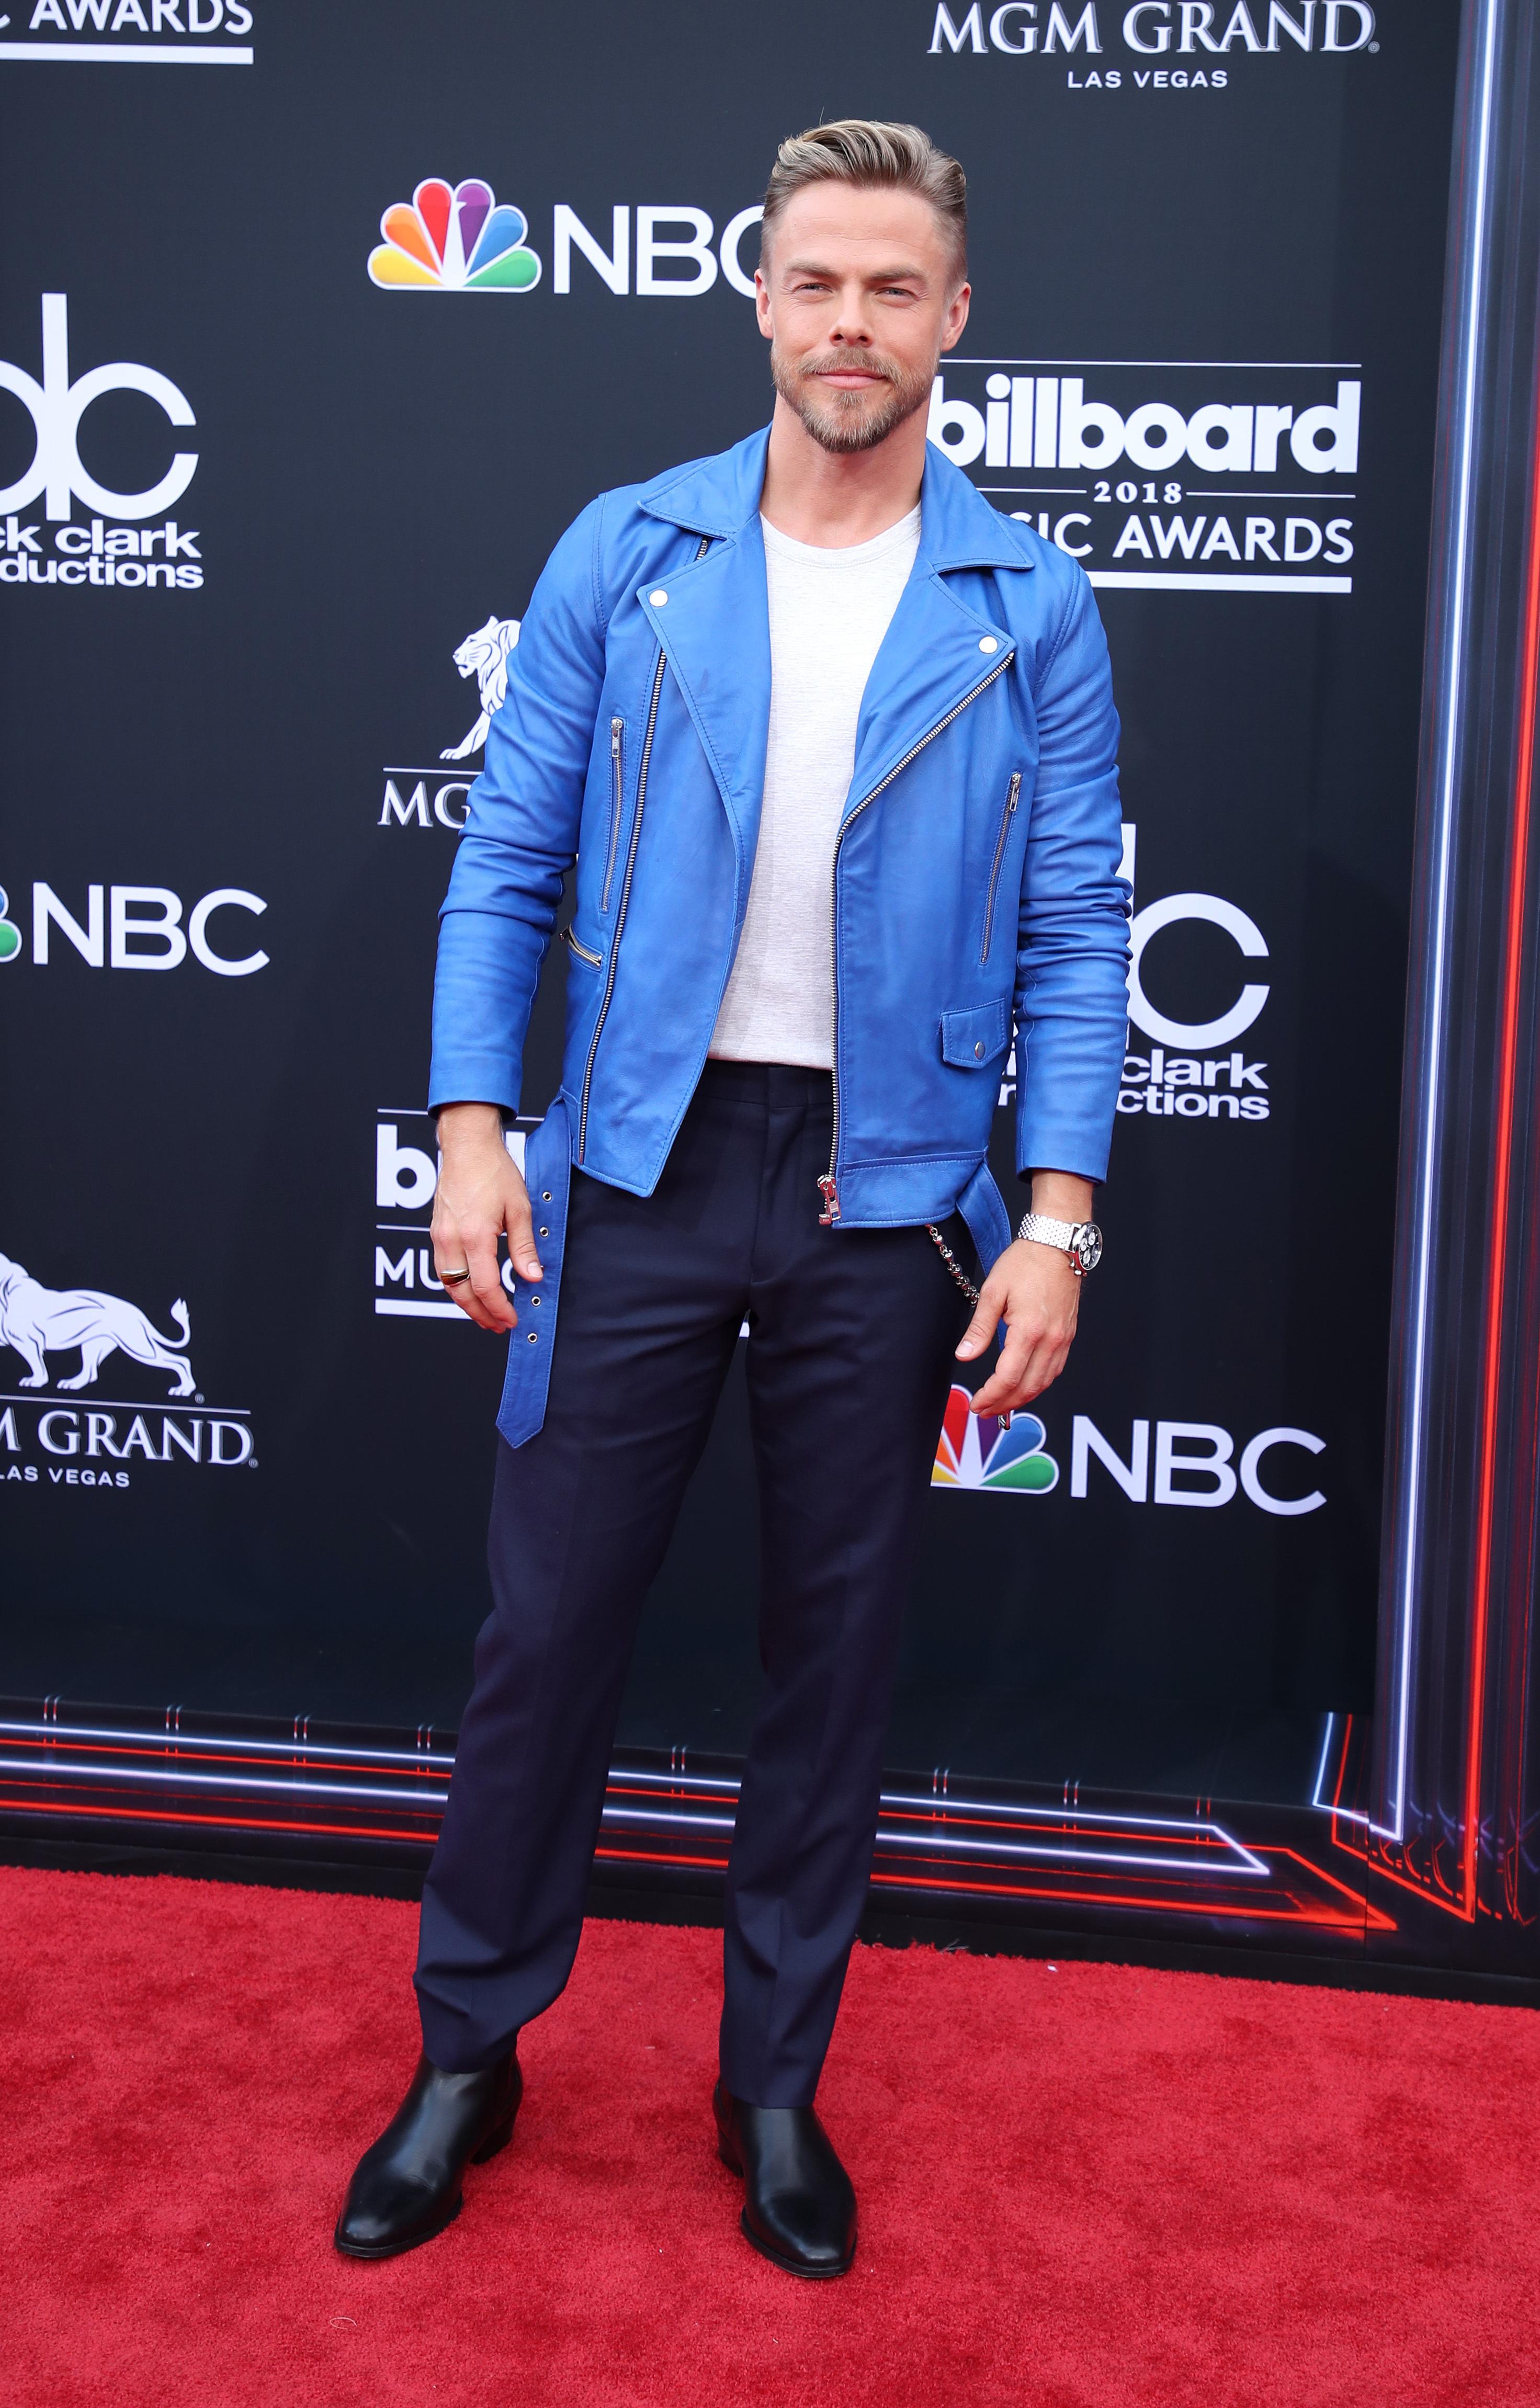 Derek Hough arrives at the Billboard Music Awards in Las Vegas on May 20, 2018.